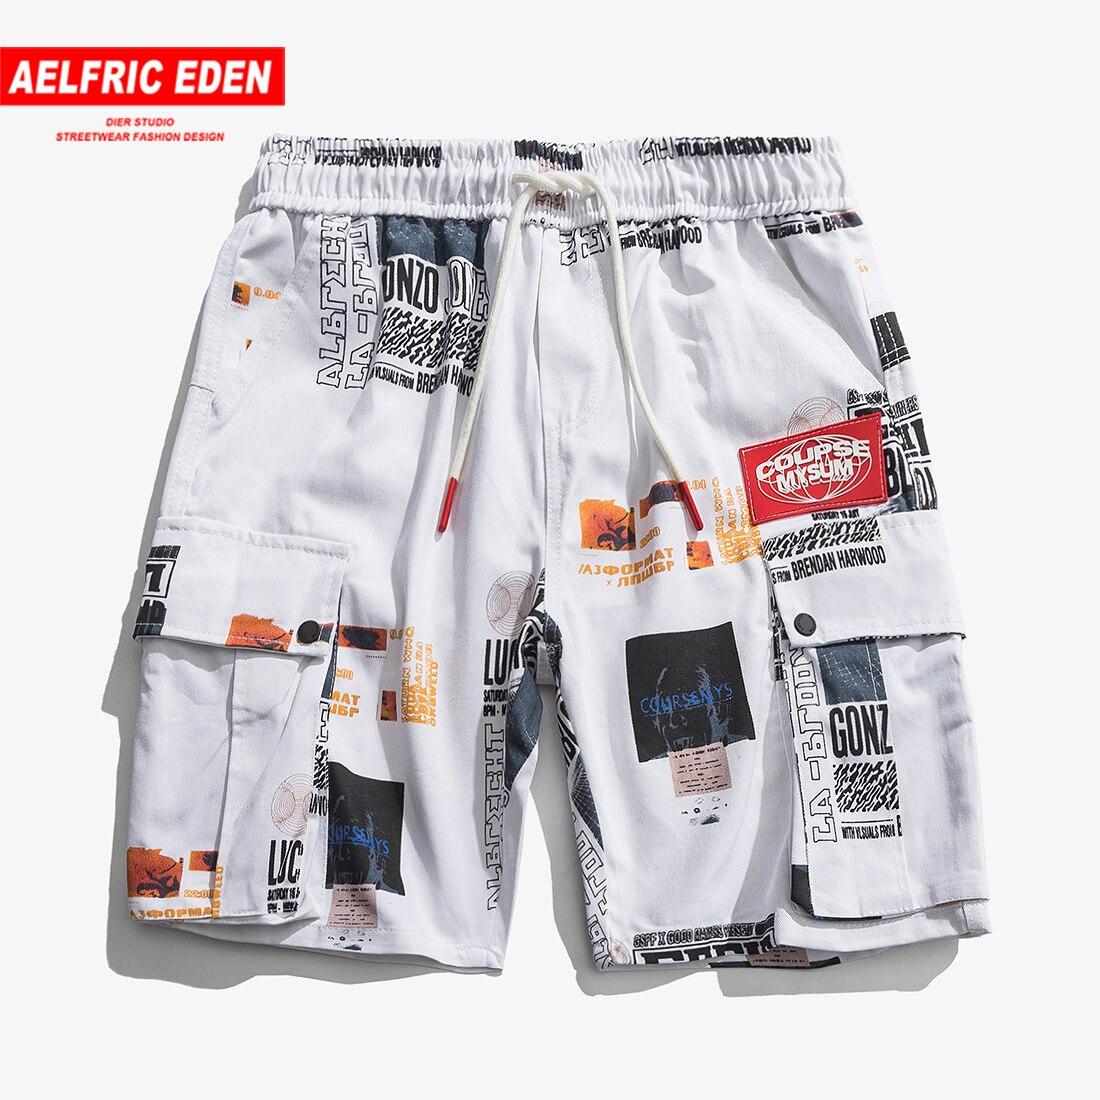 d4b3b1ab5e76 Aelfric Eden Multi-pockets Hop Hop Cargo Short Pants Vintage Badge Stitched  Casual Joggers Letter Print Streetwear Men Shorts ~ Perfect Sale June 2019